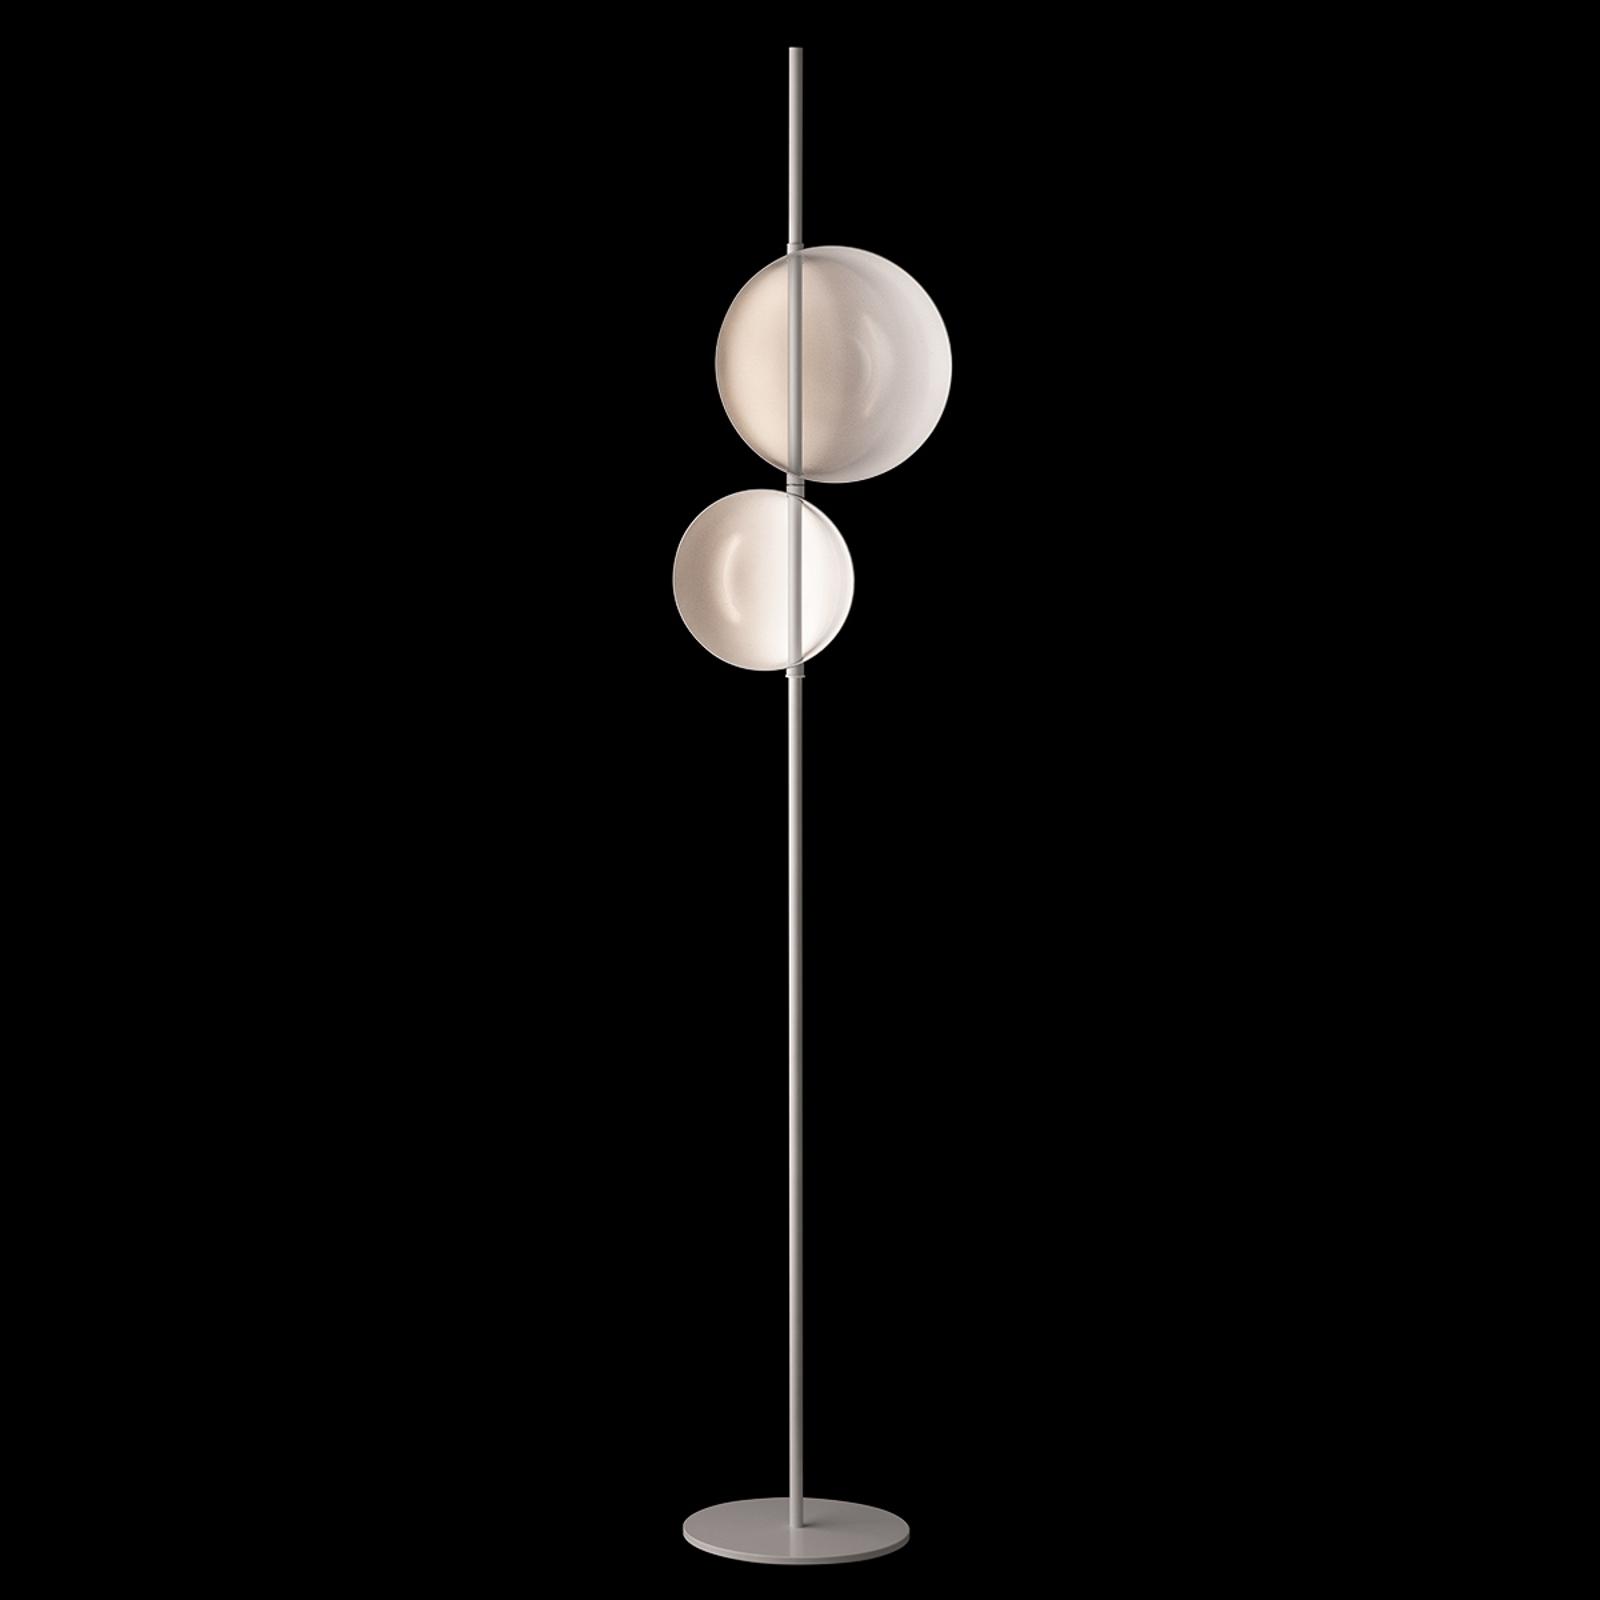 Lampada da terra di design Superlana con LED